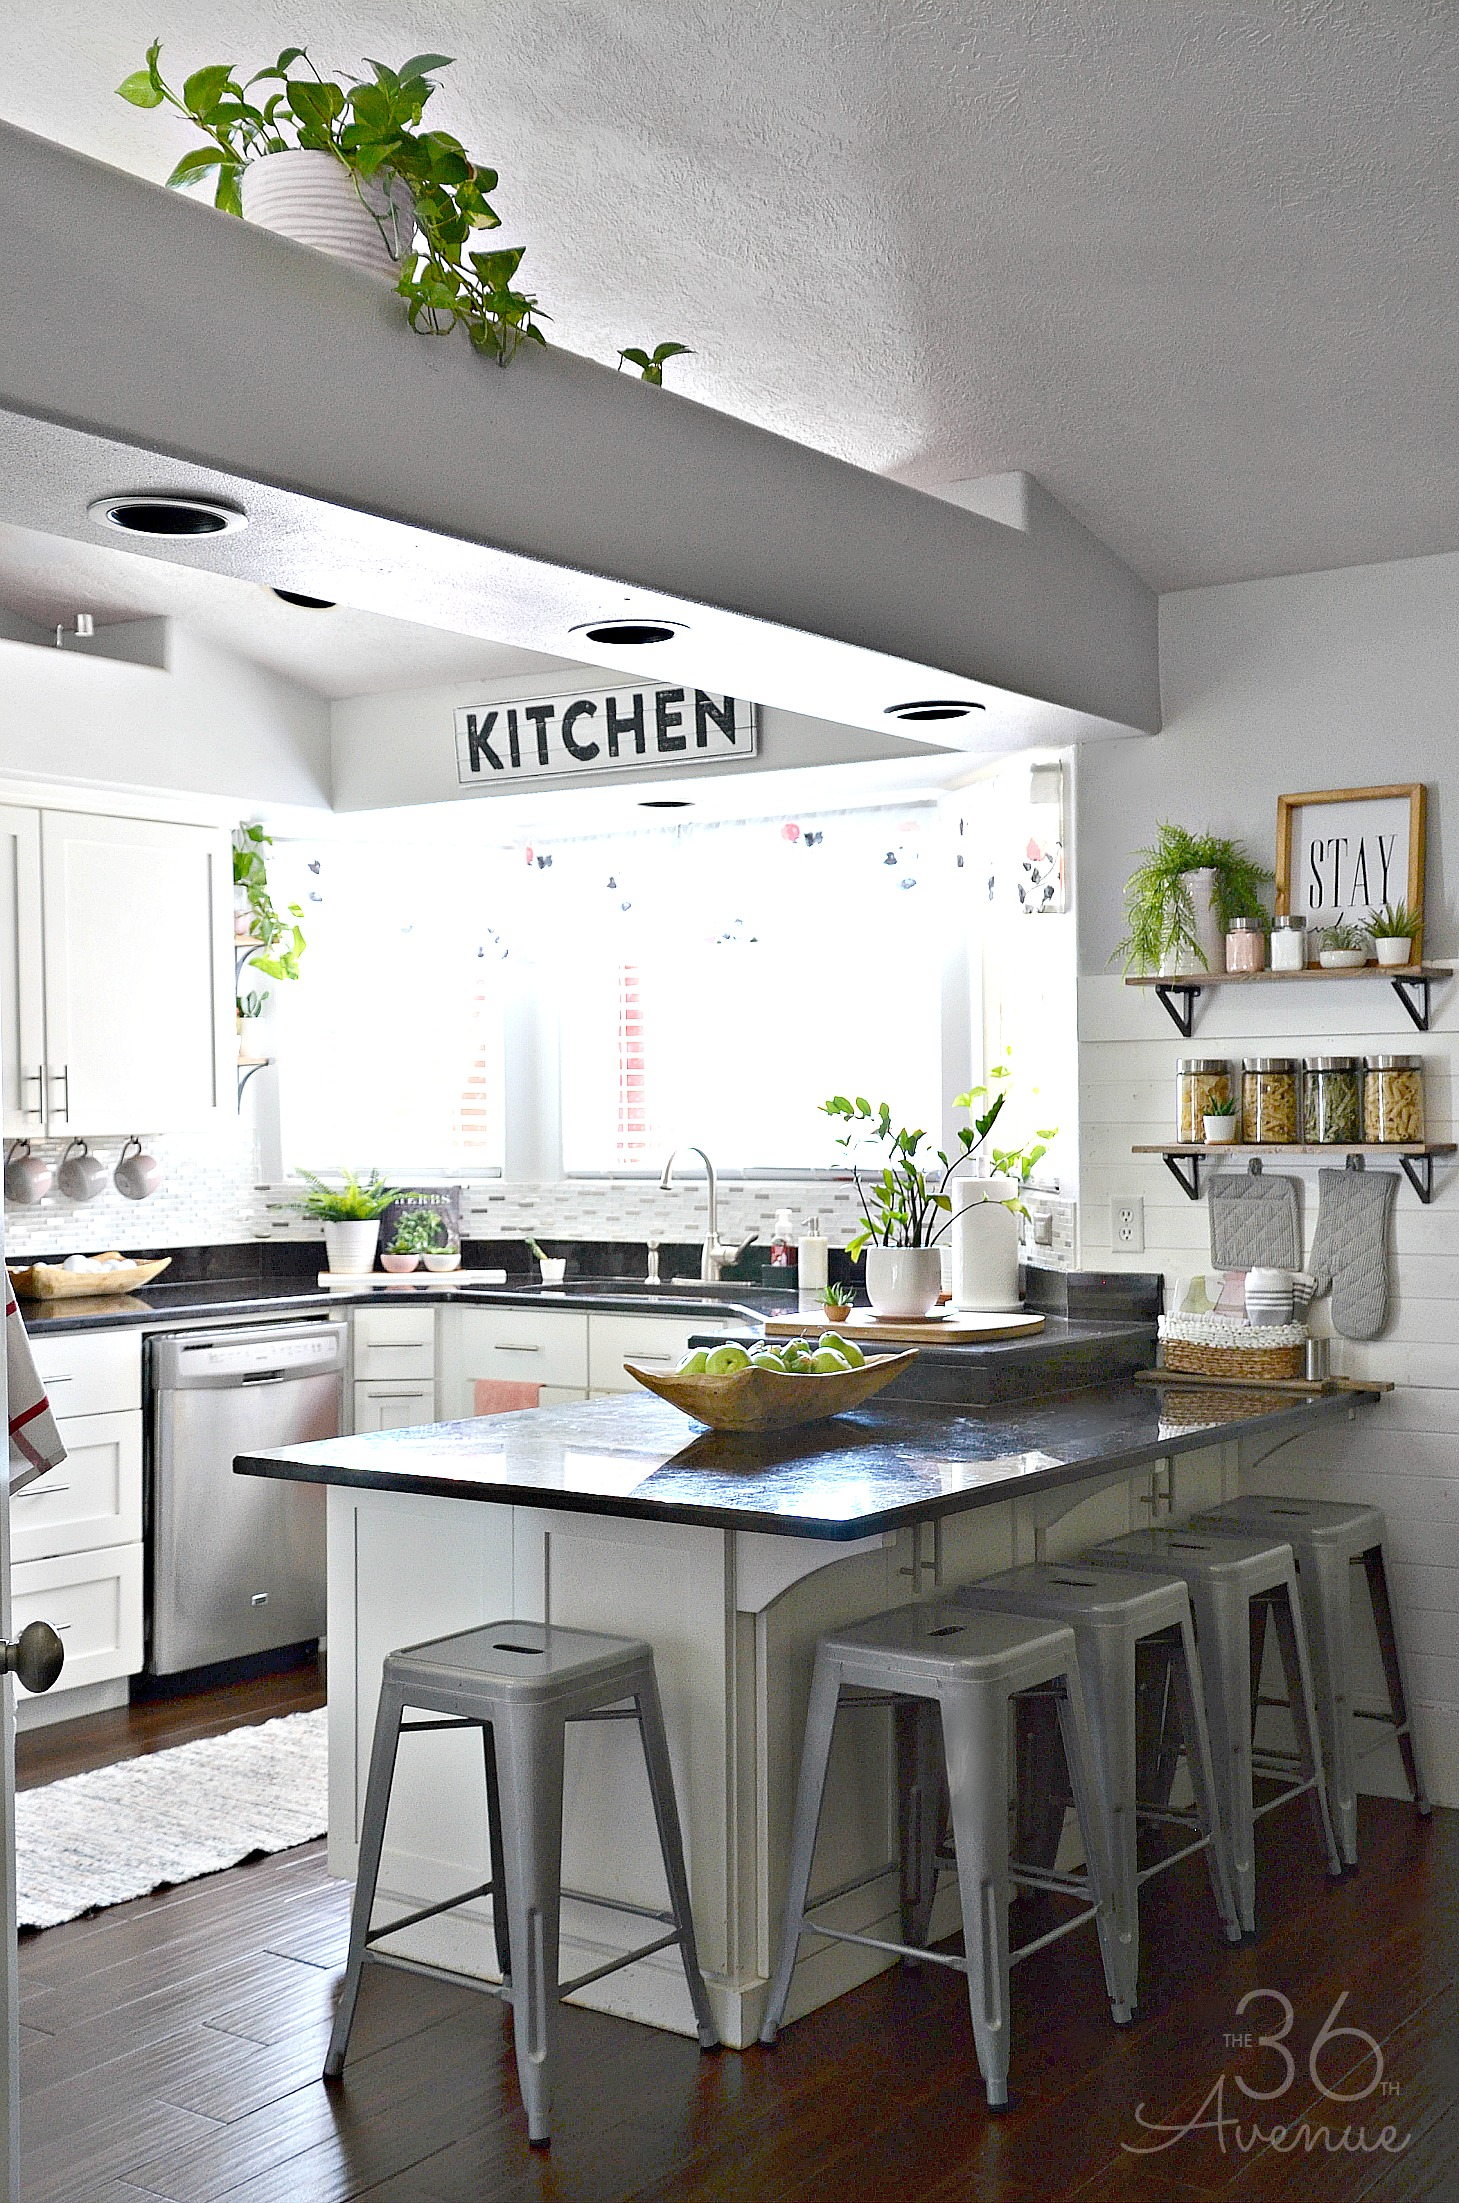 White Kitchen Decor Ideas - How to add color to a white kitchen.